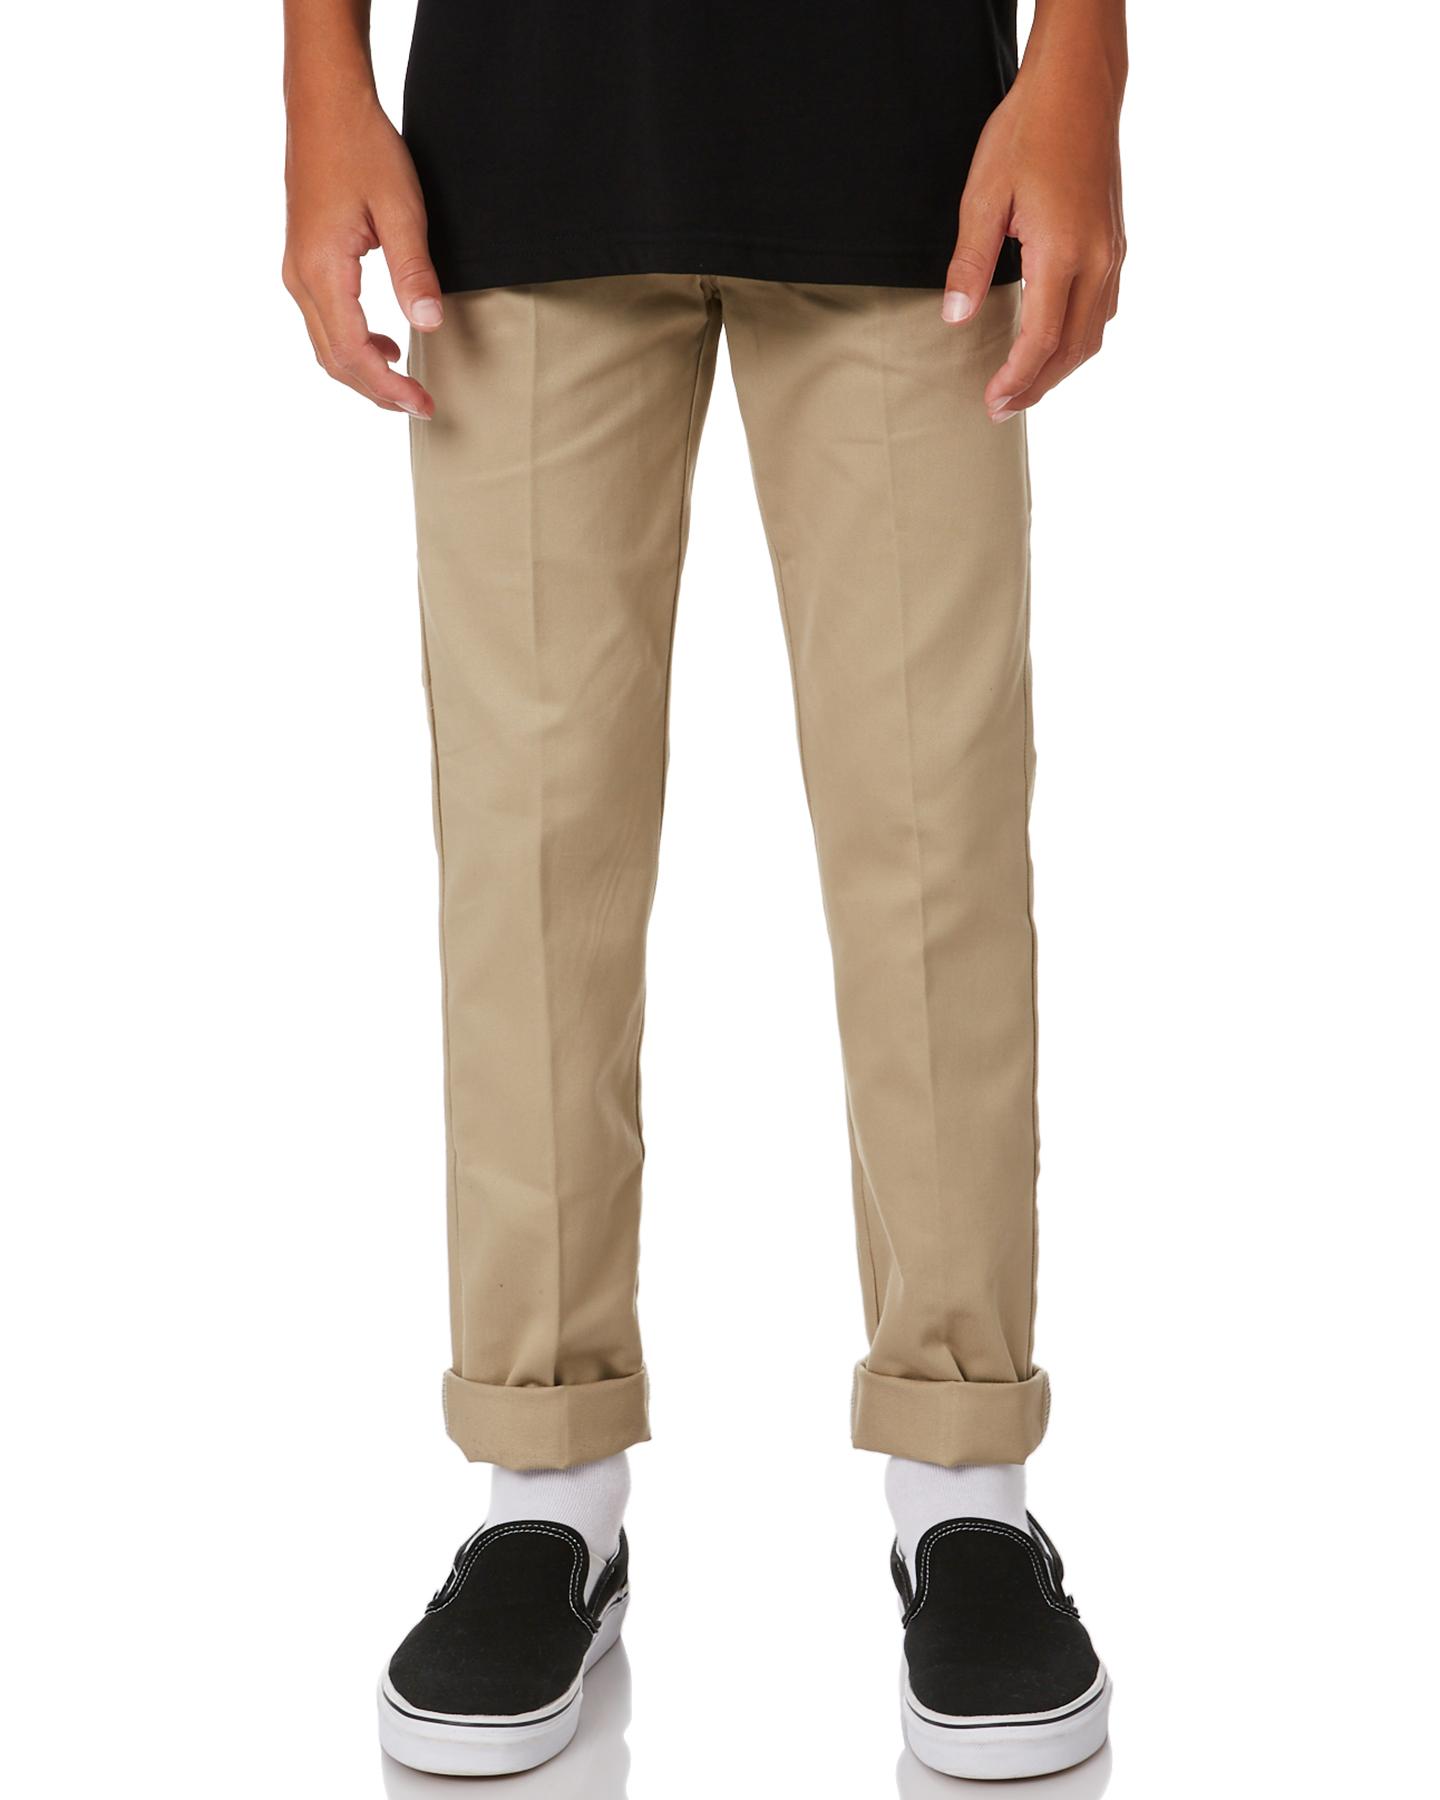 Dickies Boys Skinny Straight Fit - Teens Khaki Khaki